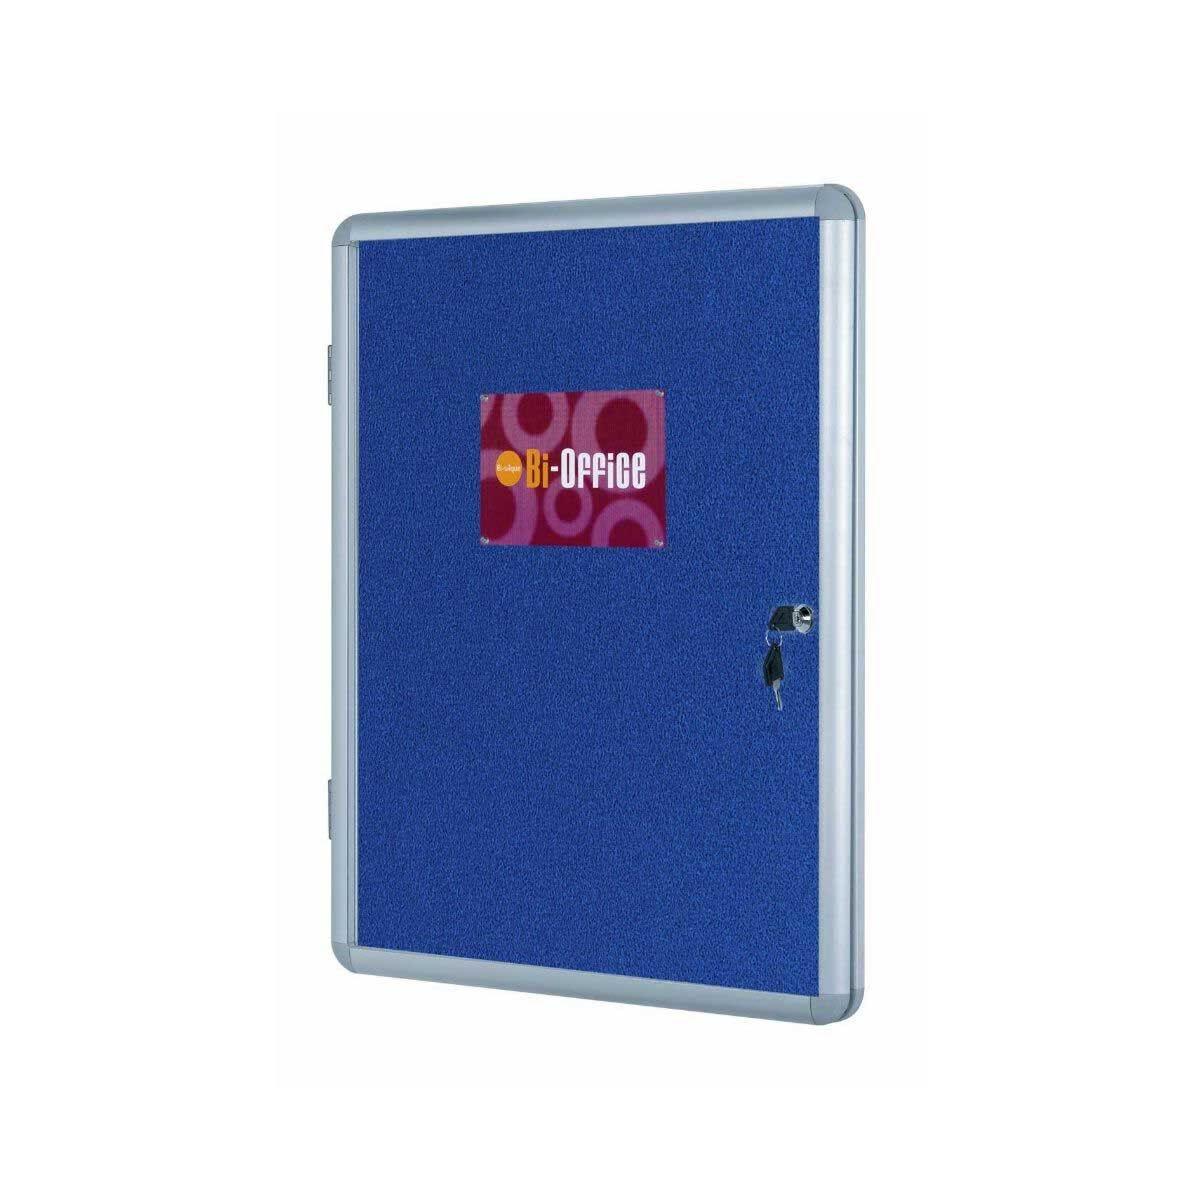 Bi-Office Display Case Felt Backed Lockable 600x450mm